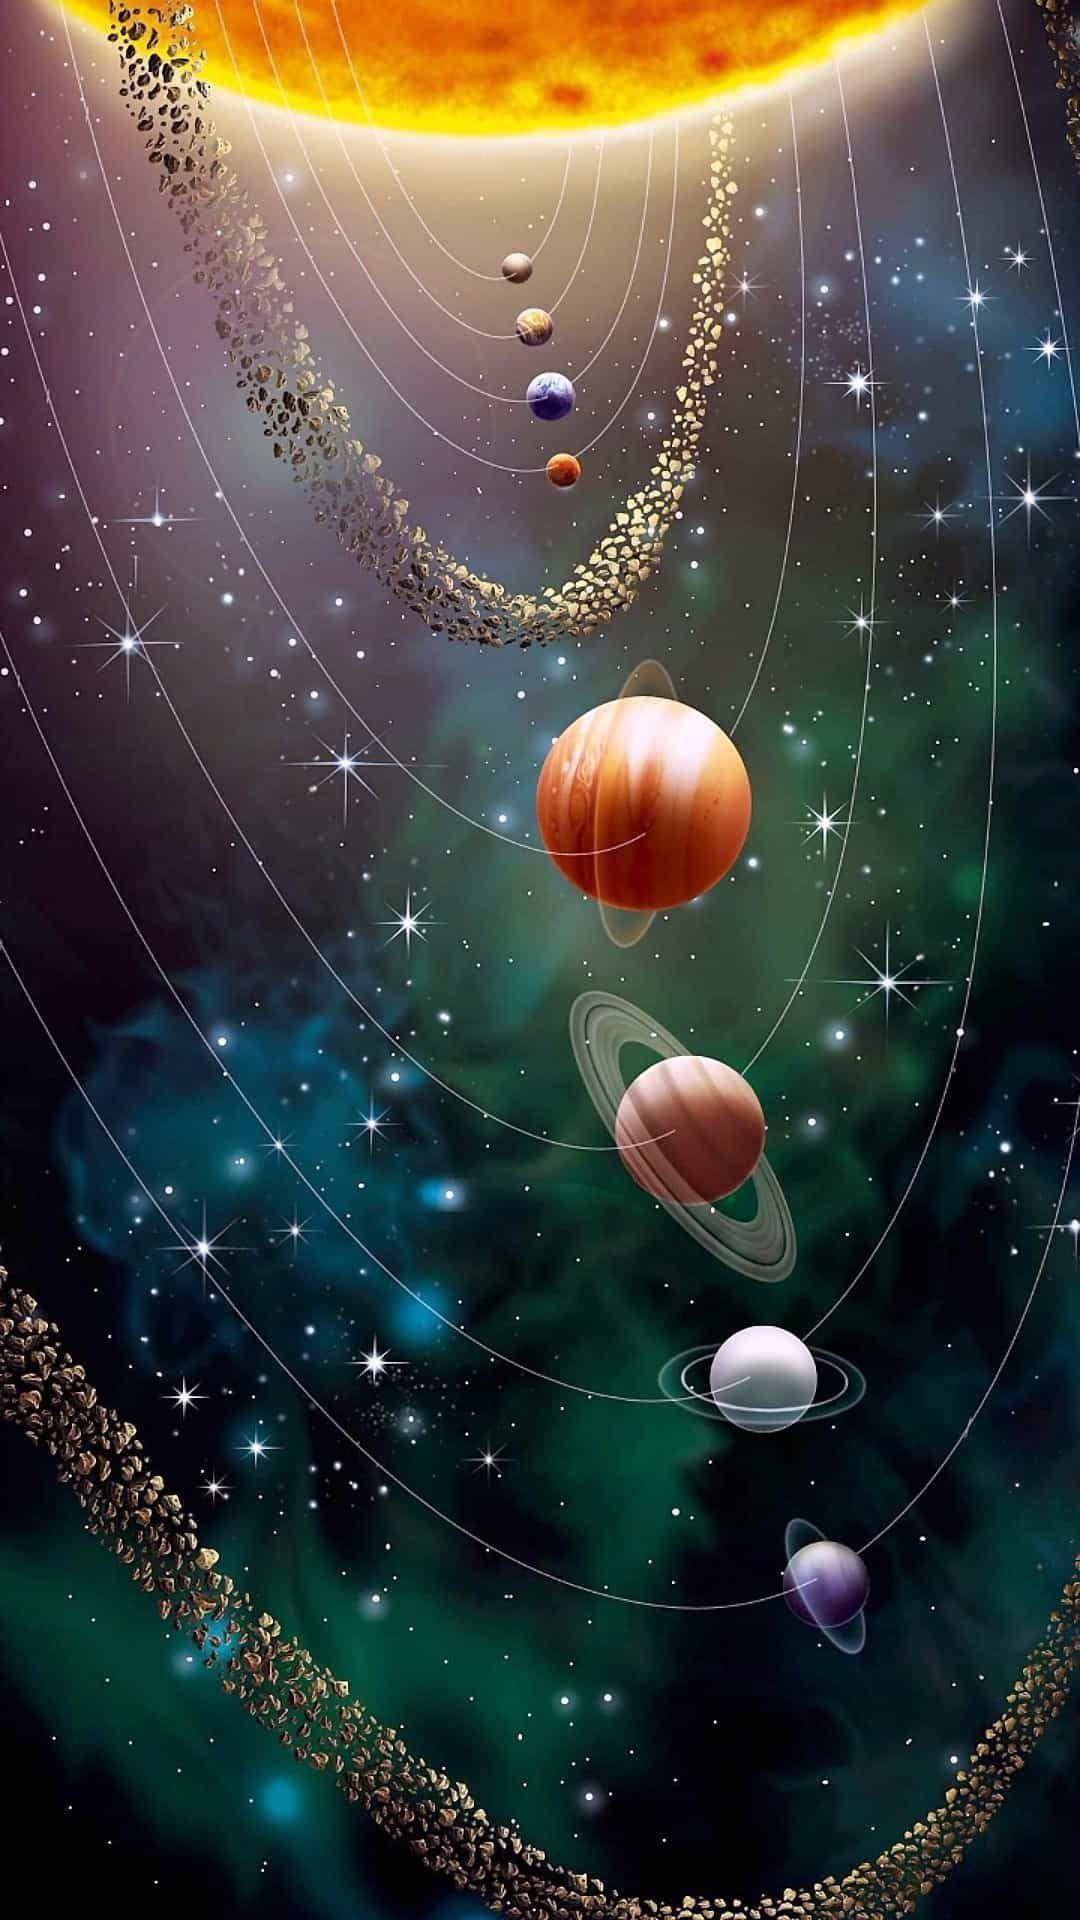 خلفيات ايفون Wallpaper Space Galaxy Wallpaper Planets Wallpaper